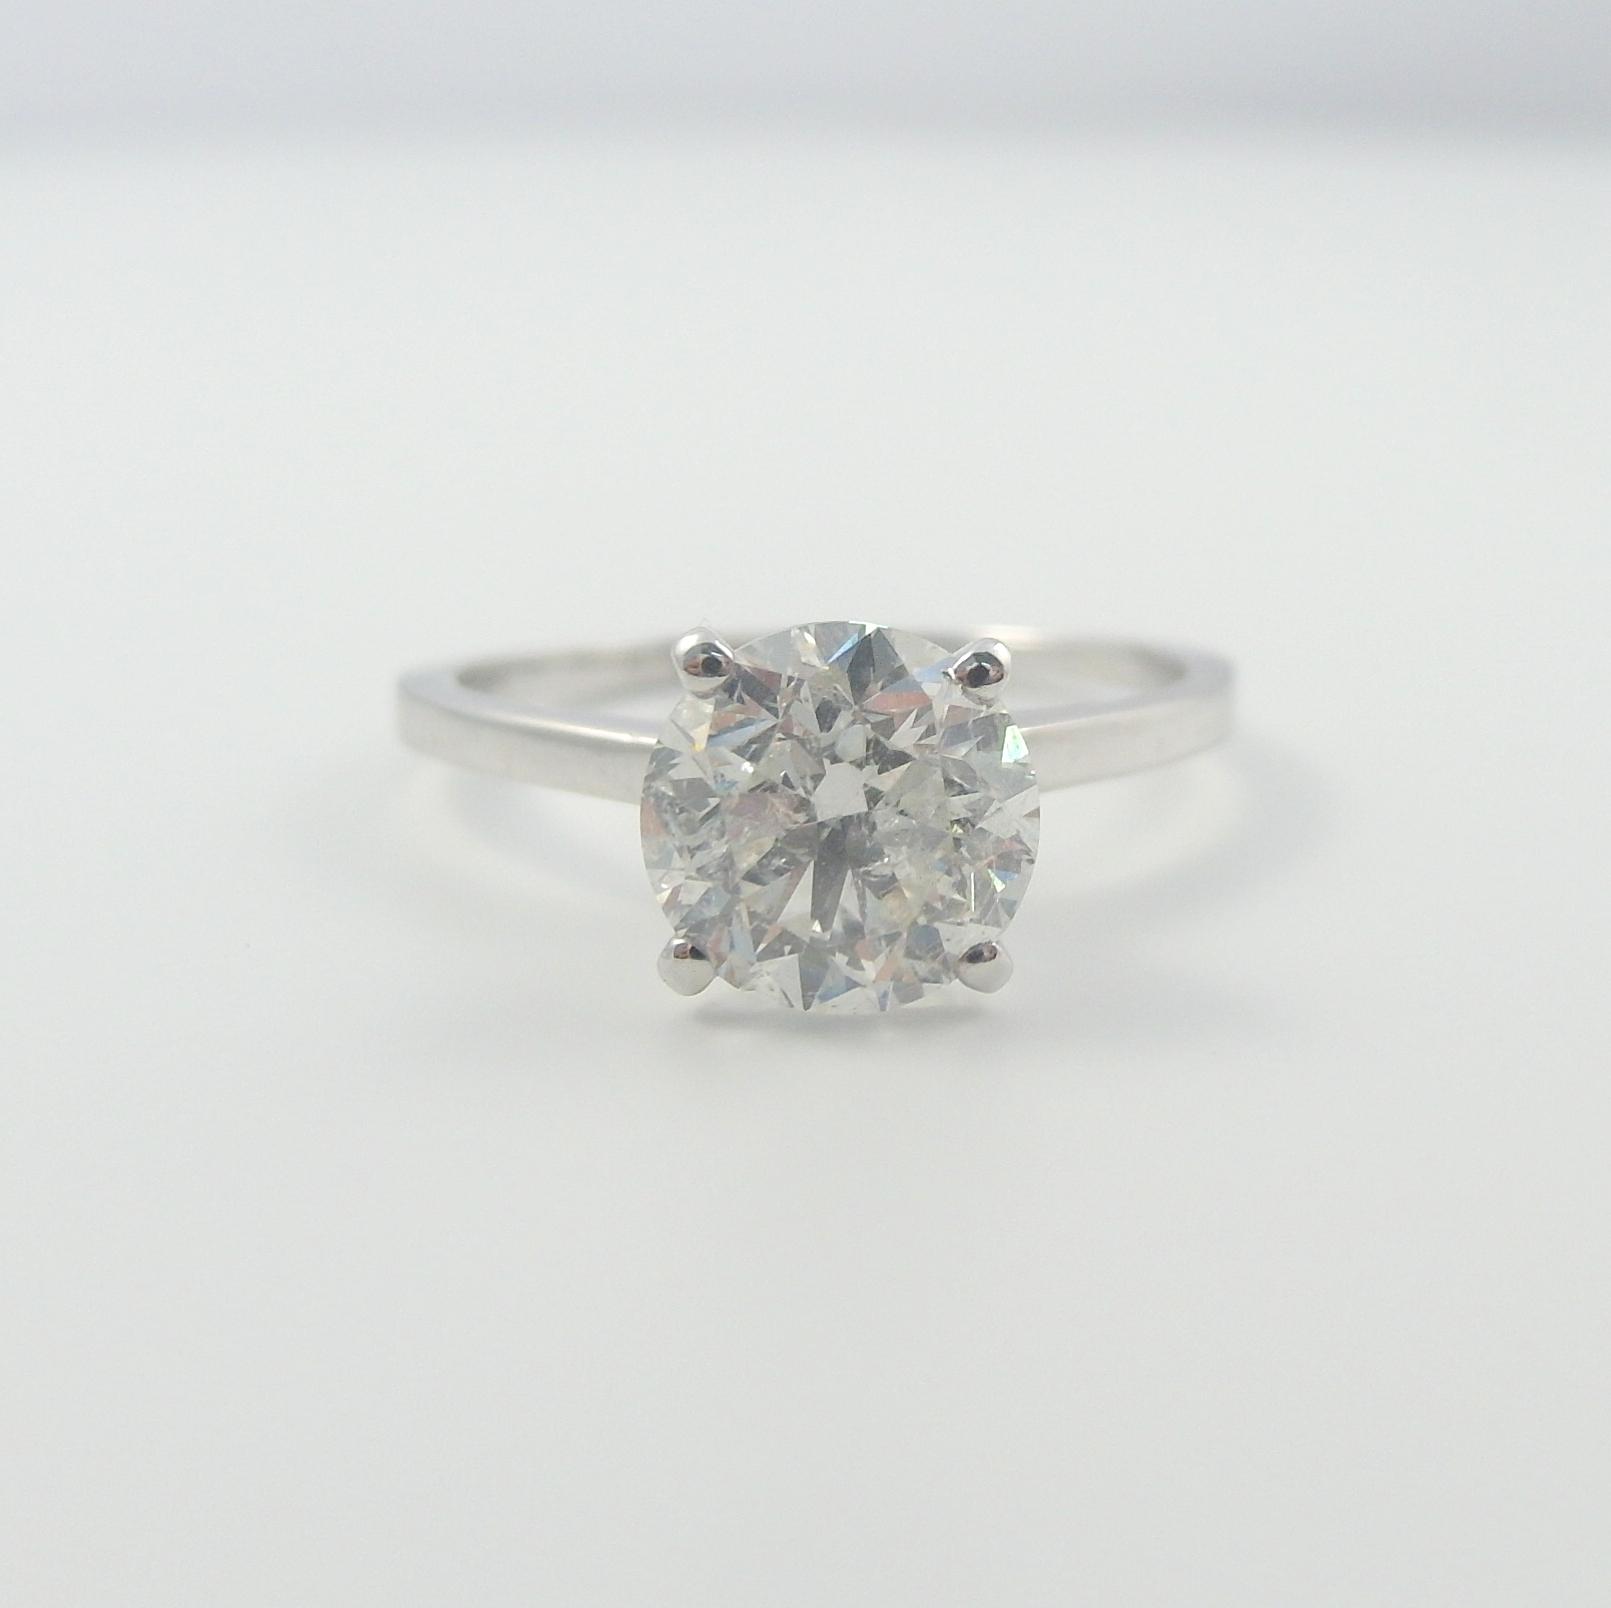 ebay wedding rings sets ROUND SHAPE DIAMOND RING 3 CARATS 18K WHITE